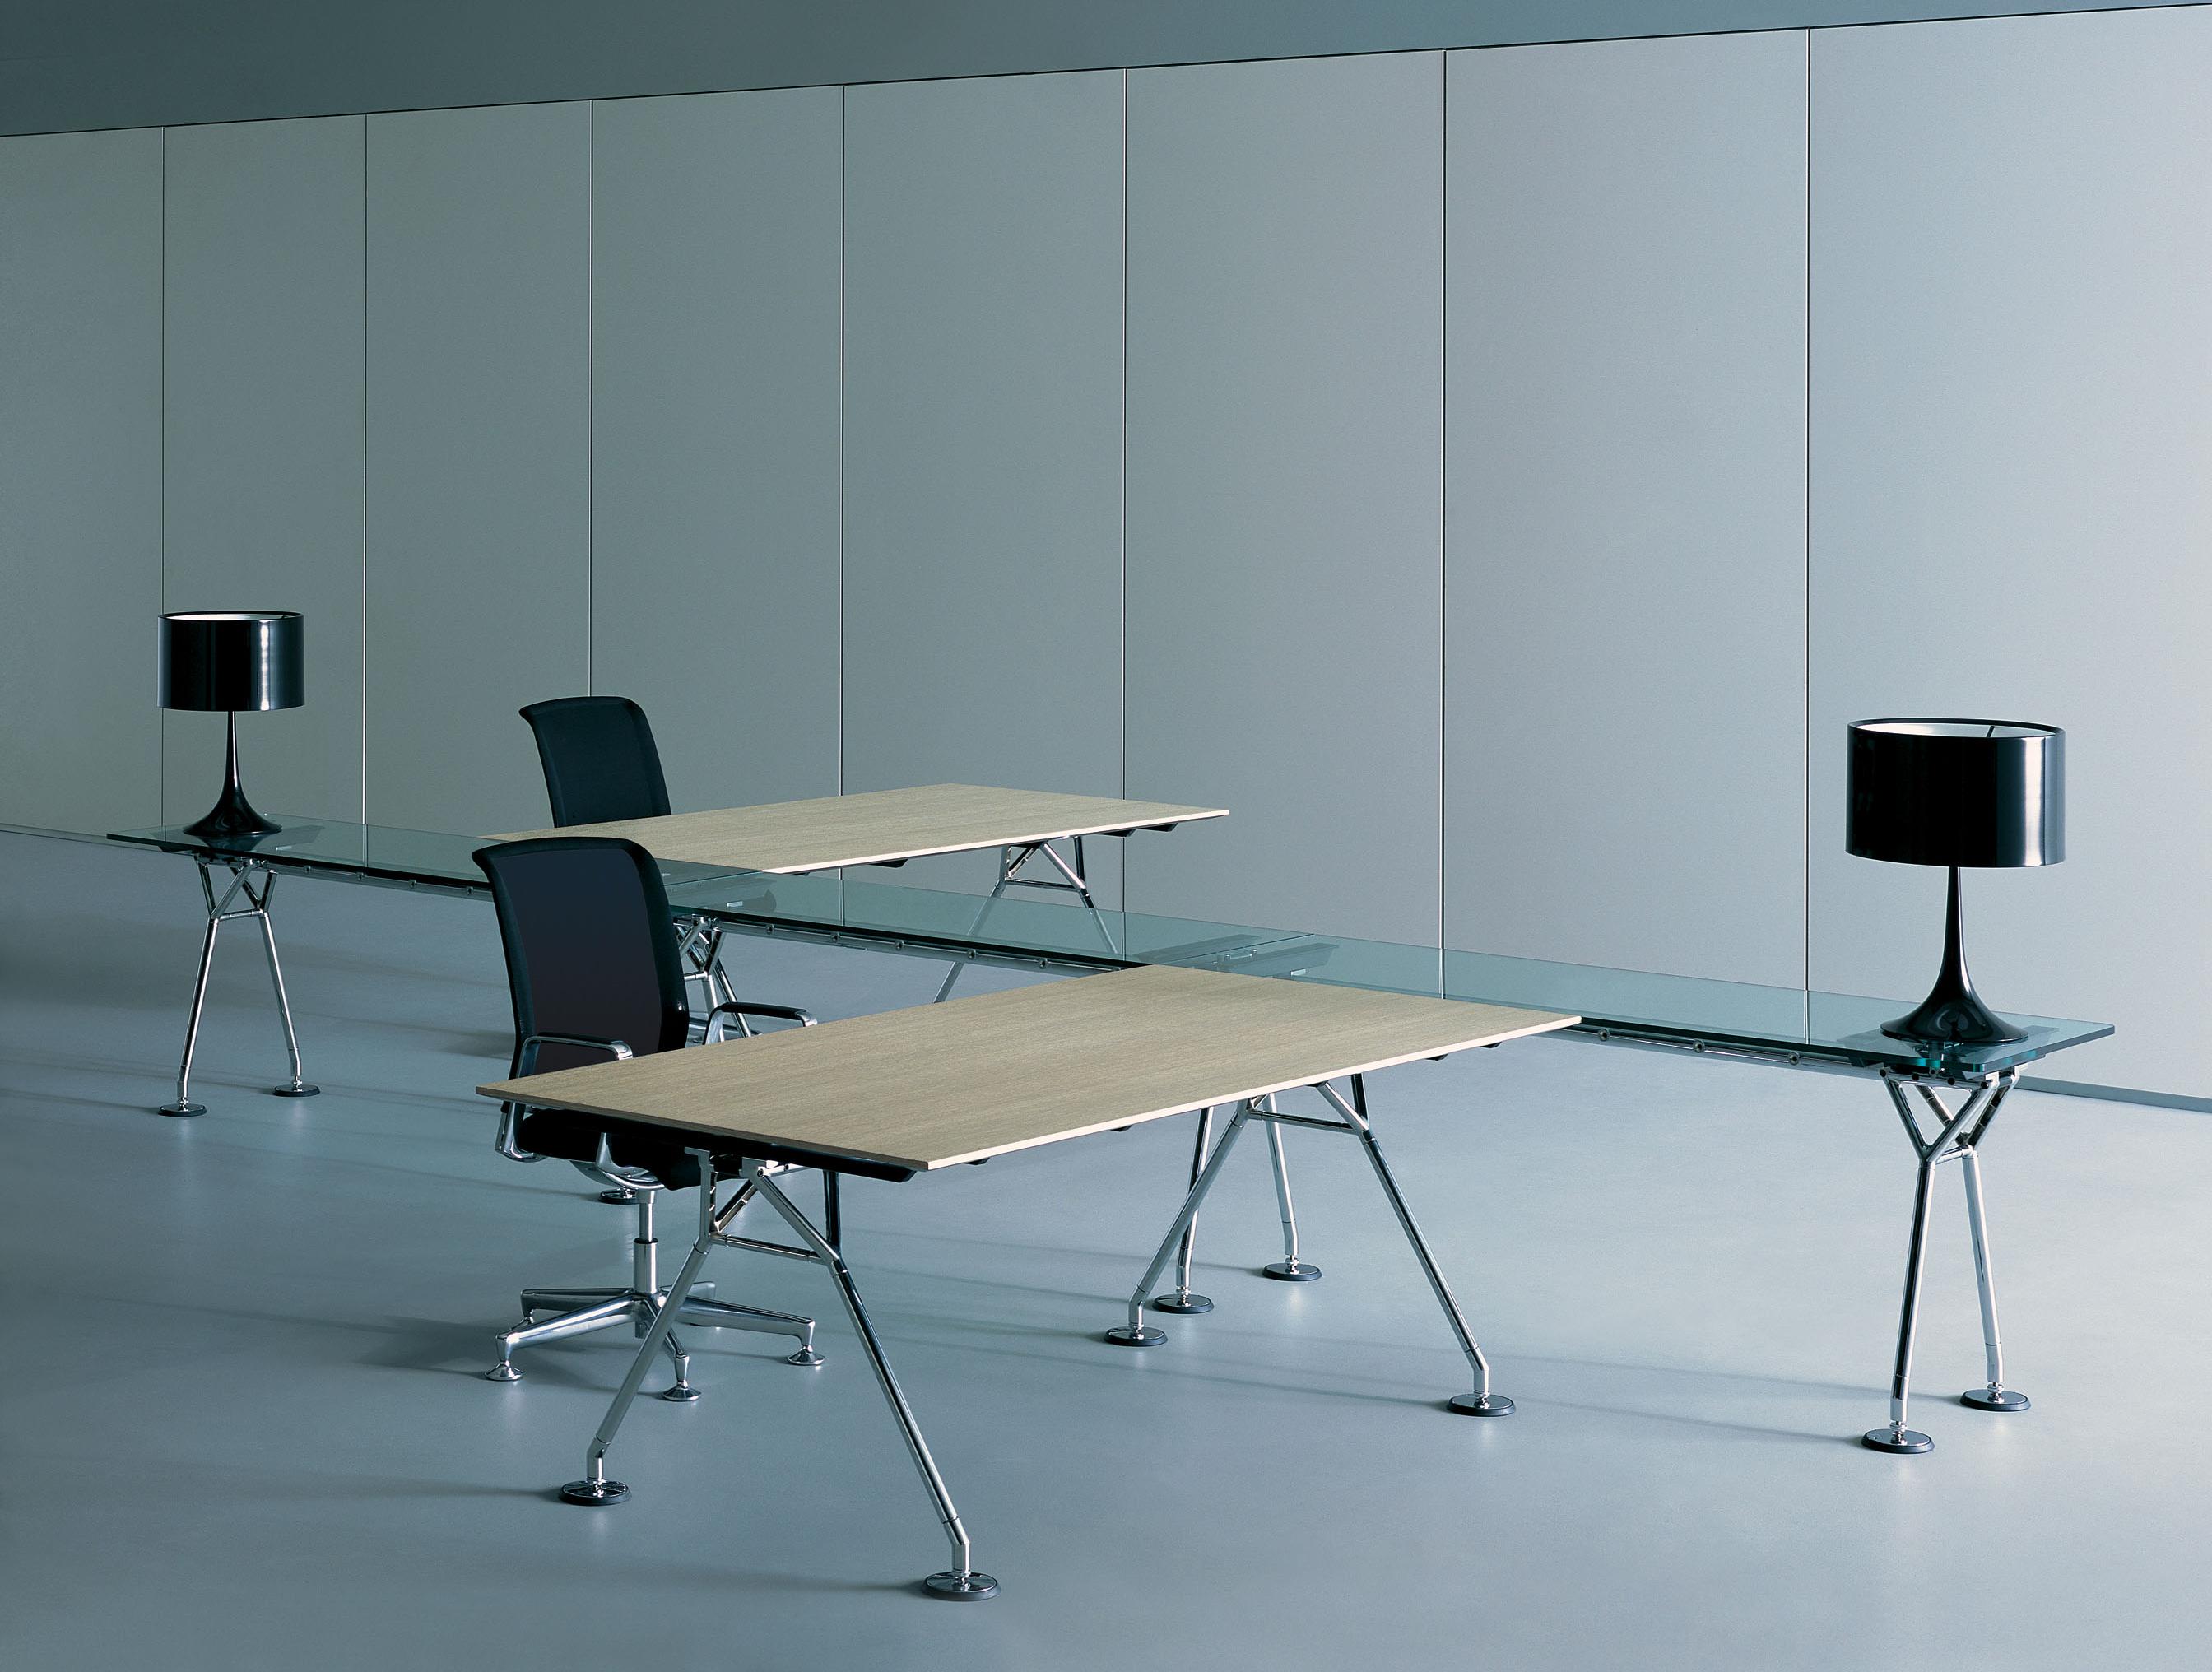 Contract Furniture Open Plan Nomos Bench System By Tecno Mobili Tecno Spazi